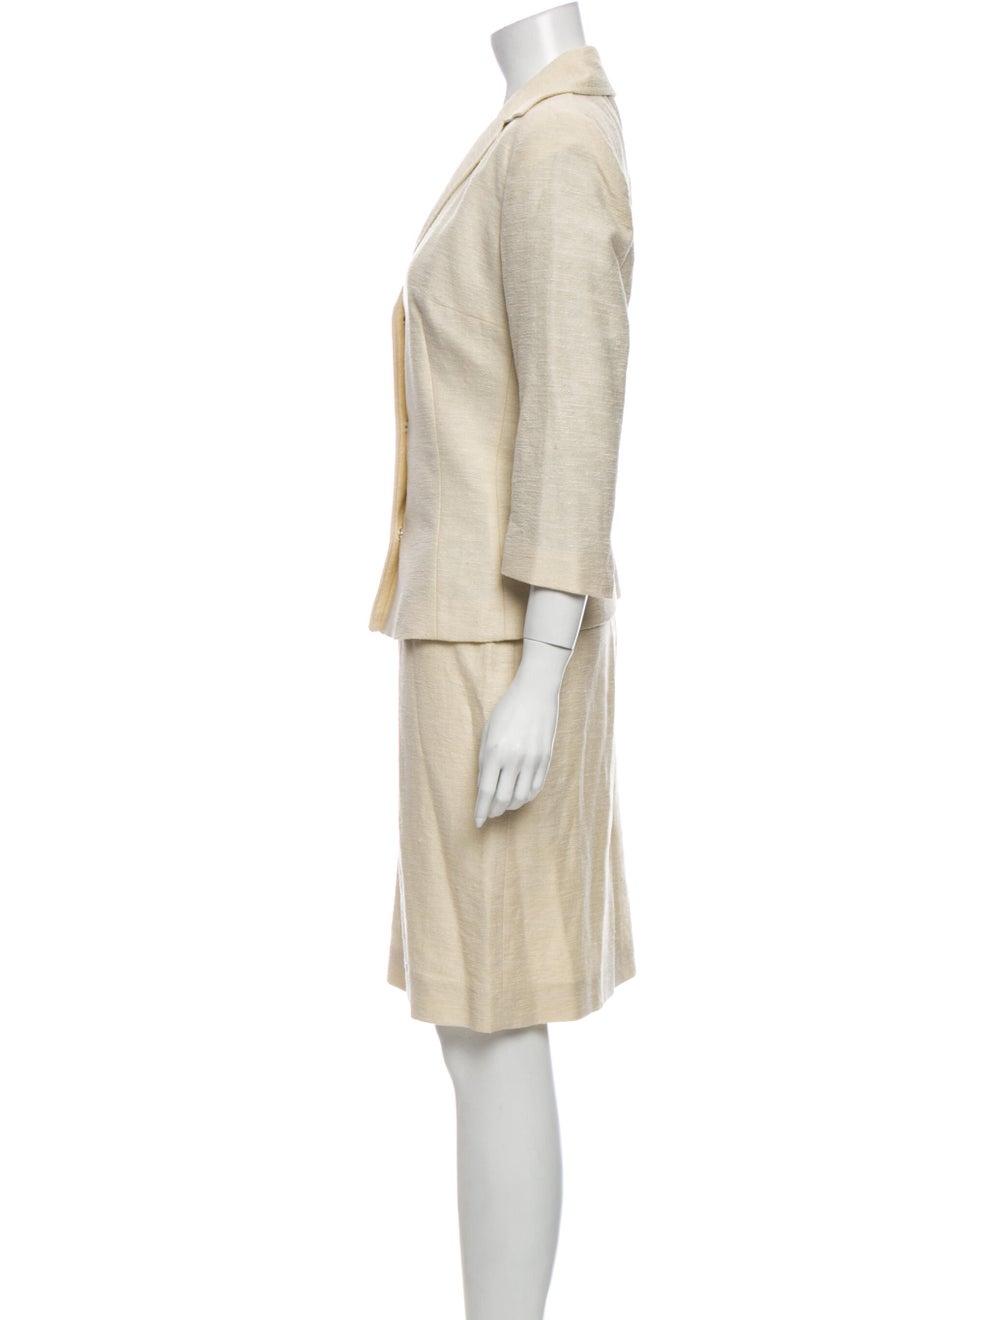 Dolce & Gabbana Linen Skirt Suit - image 2